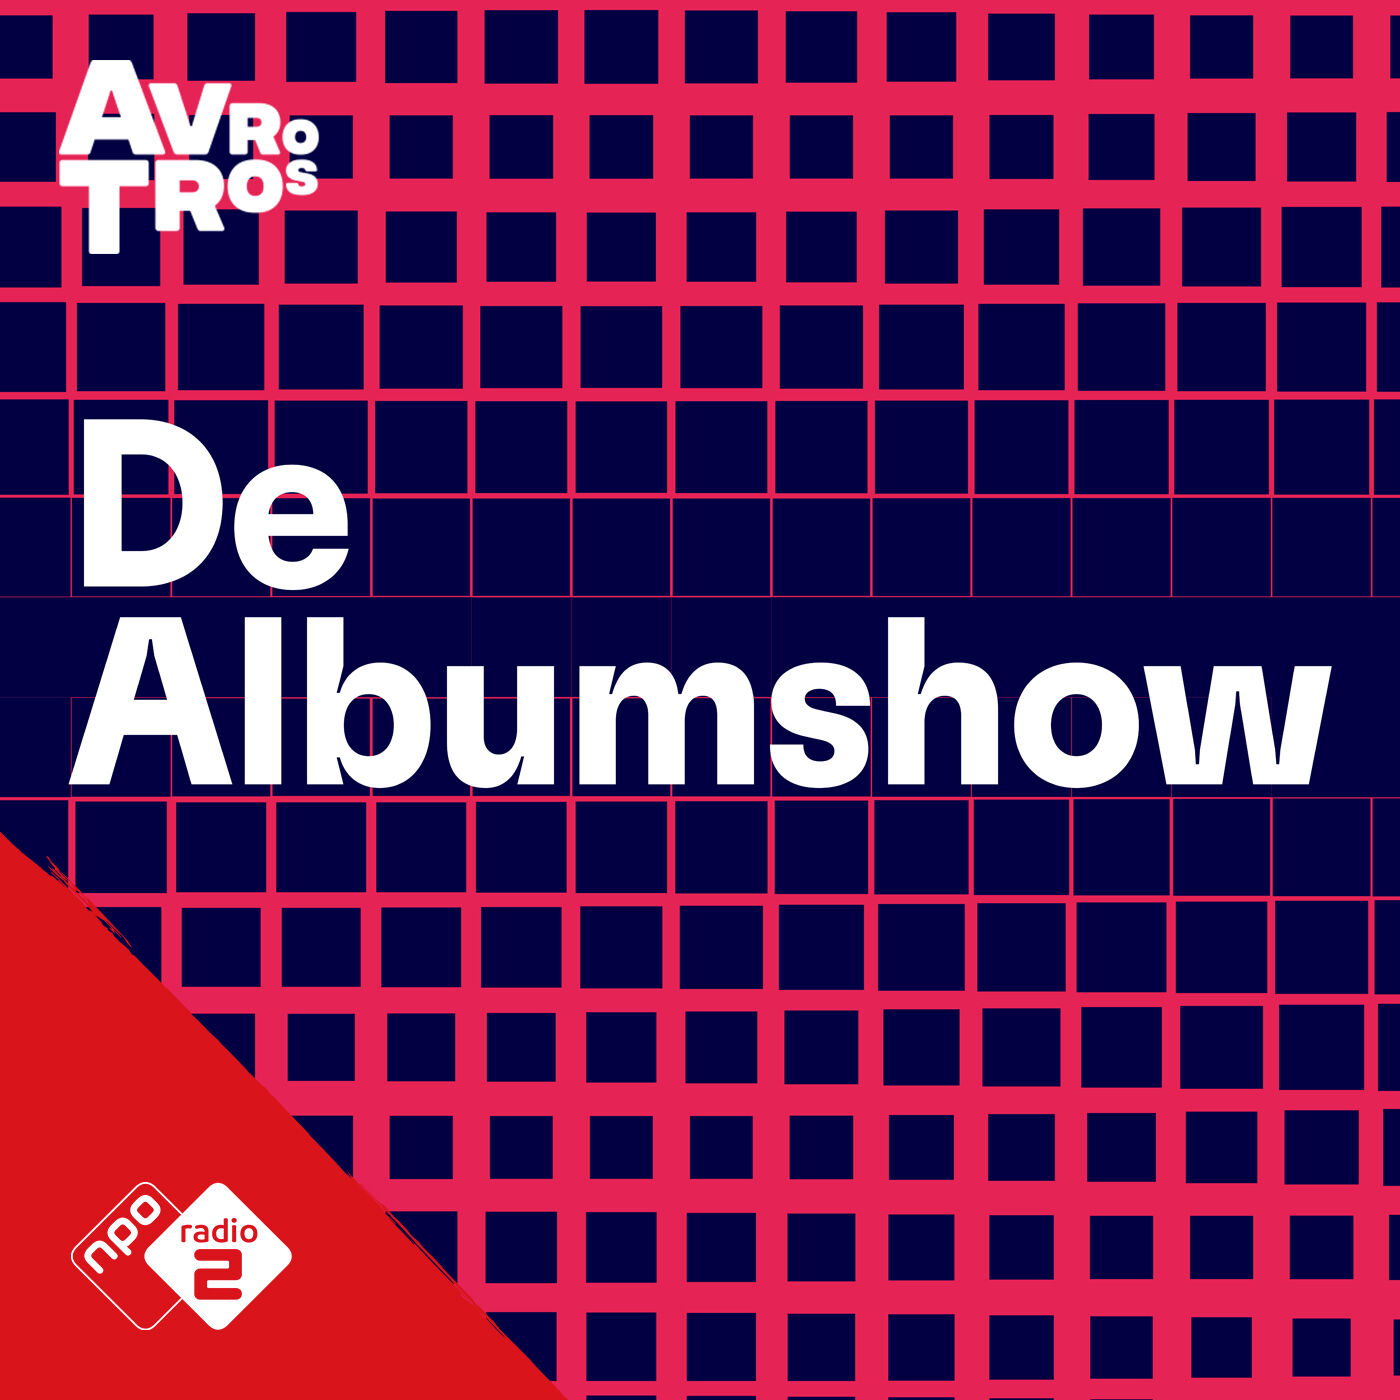 De Albumshow logo